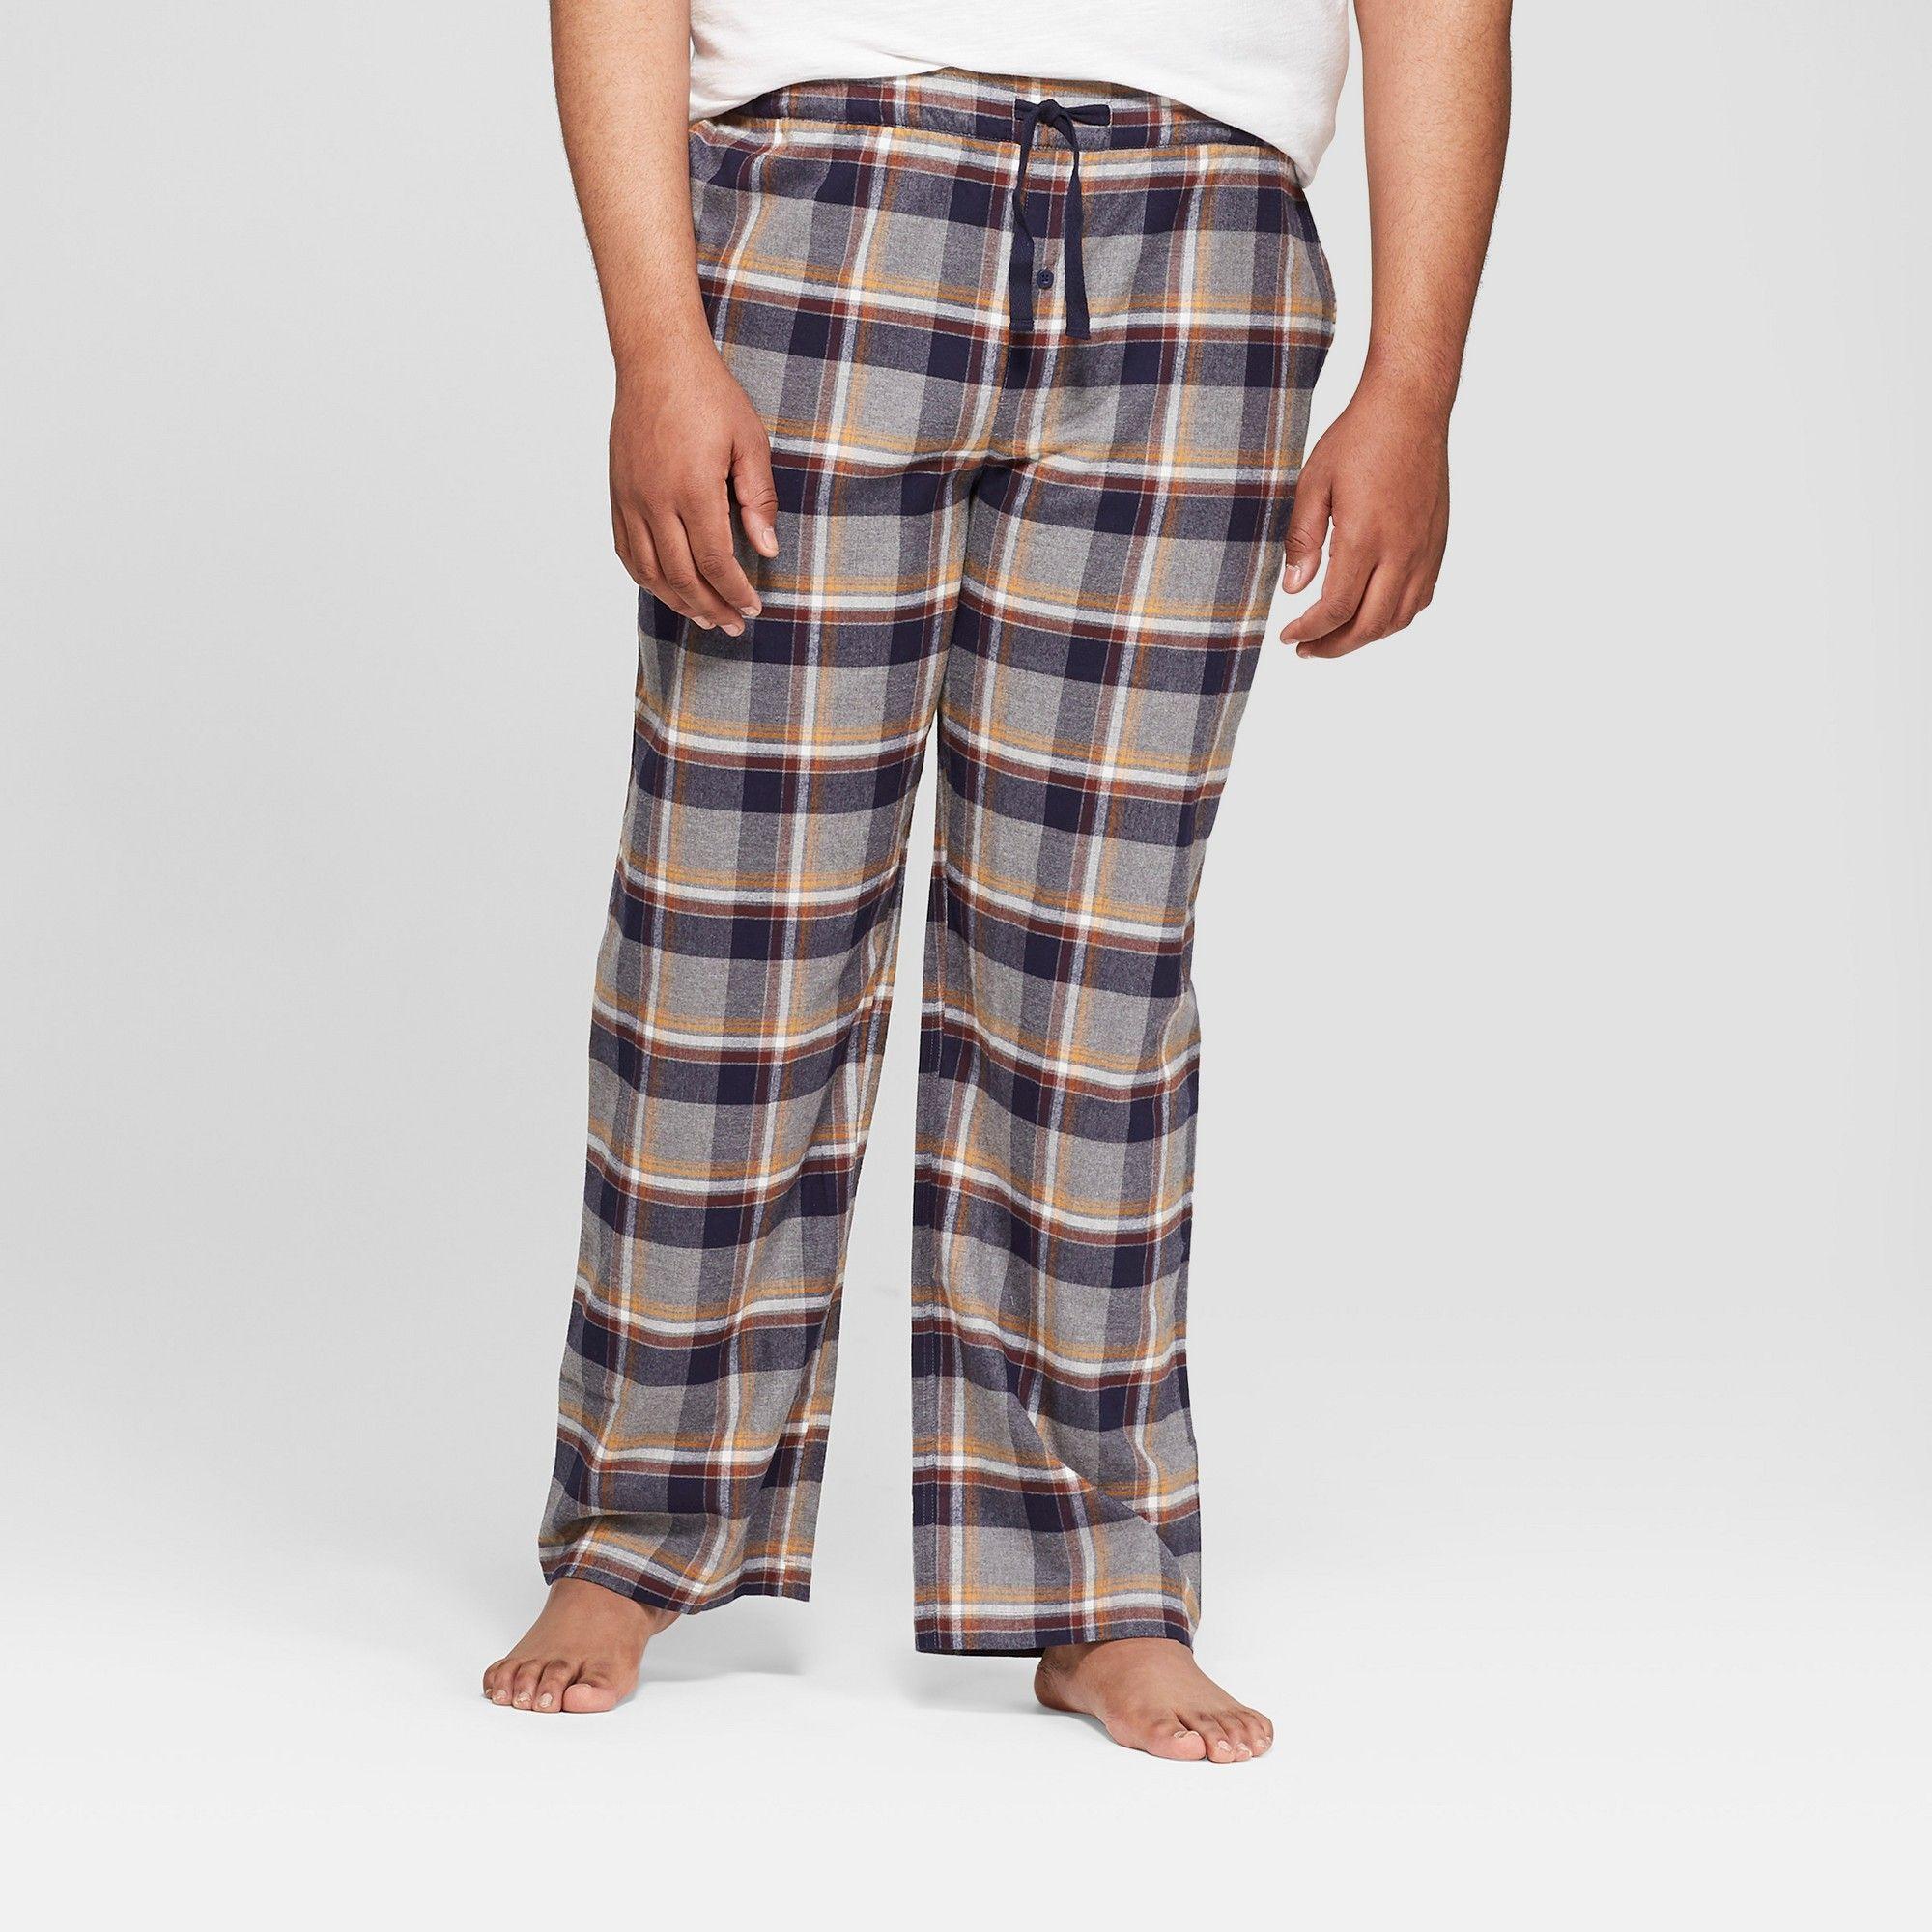 Goodfellow /& Co Men/'s Sleep PJs  Lounge short Pants Plaid cotton pocket New